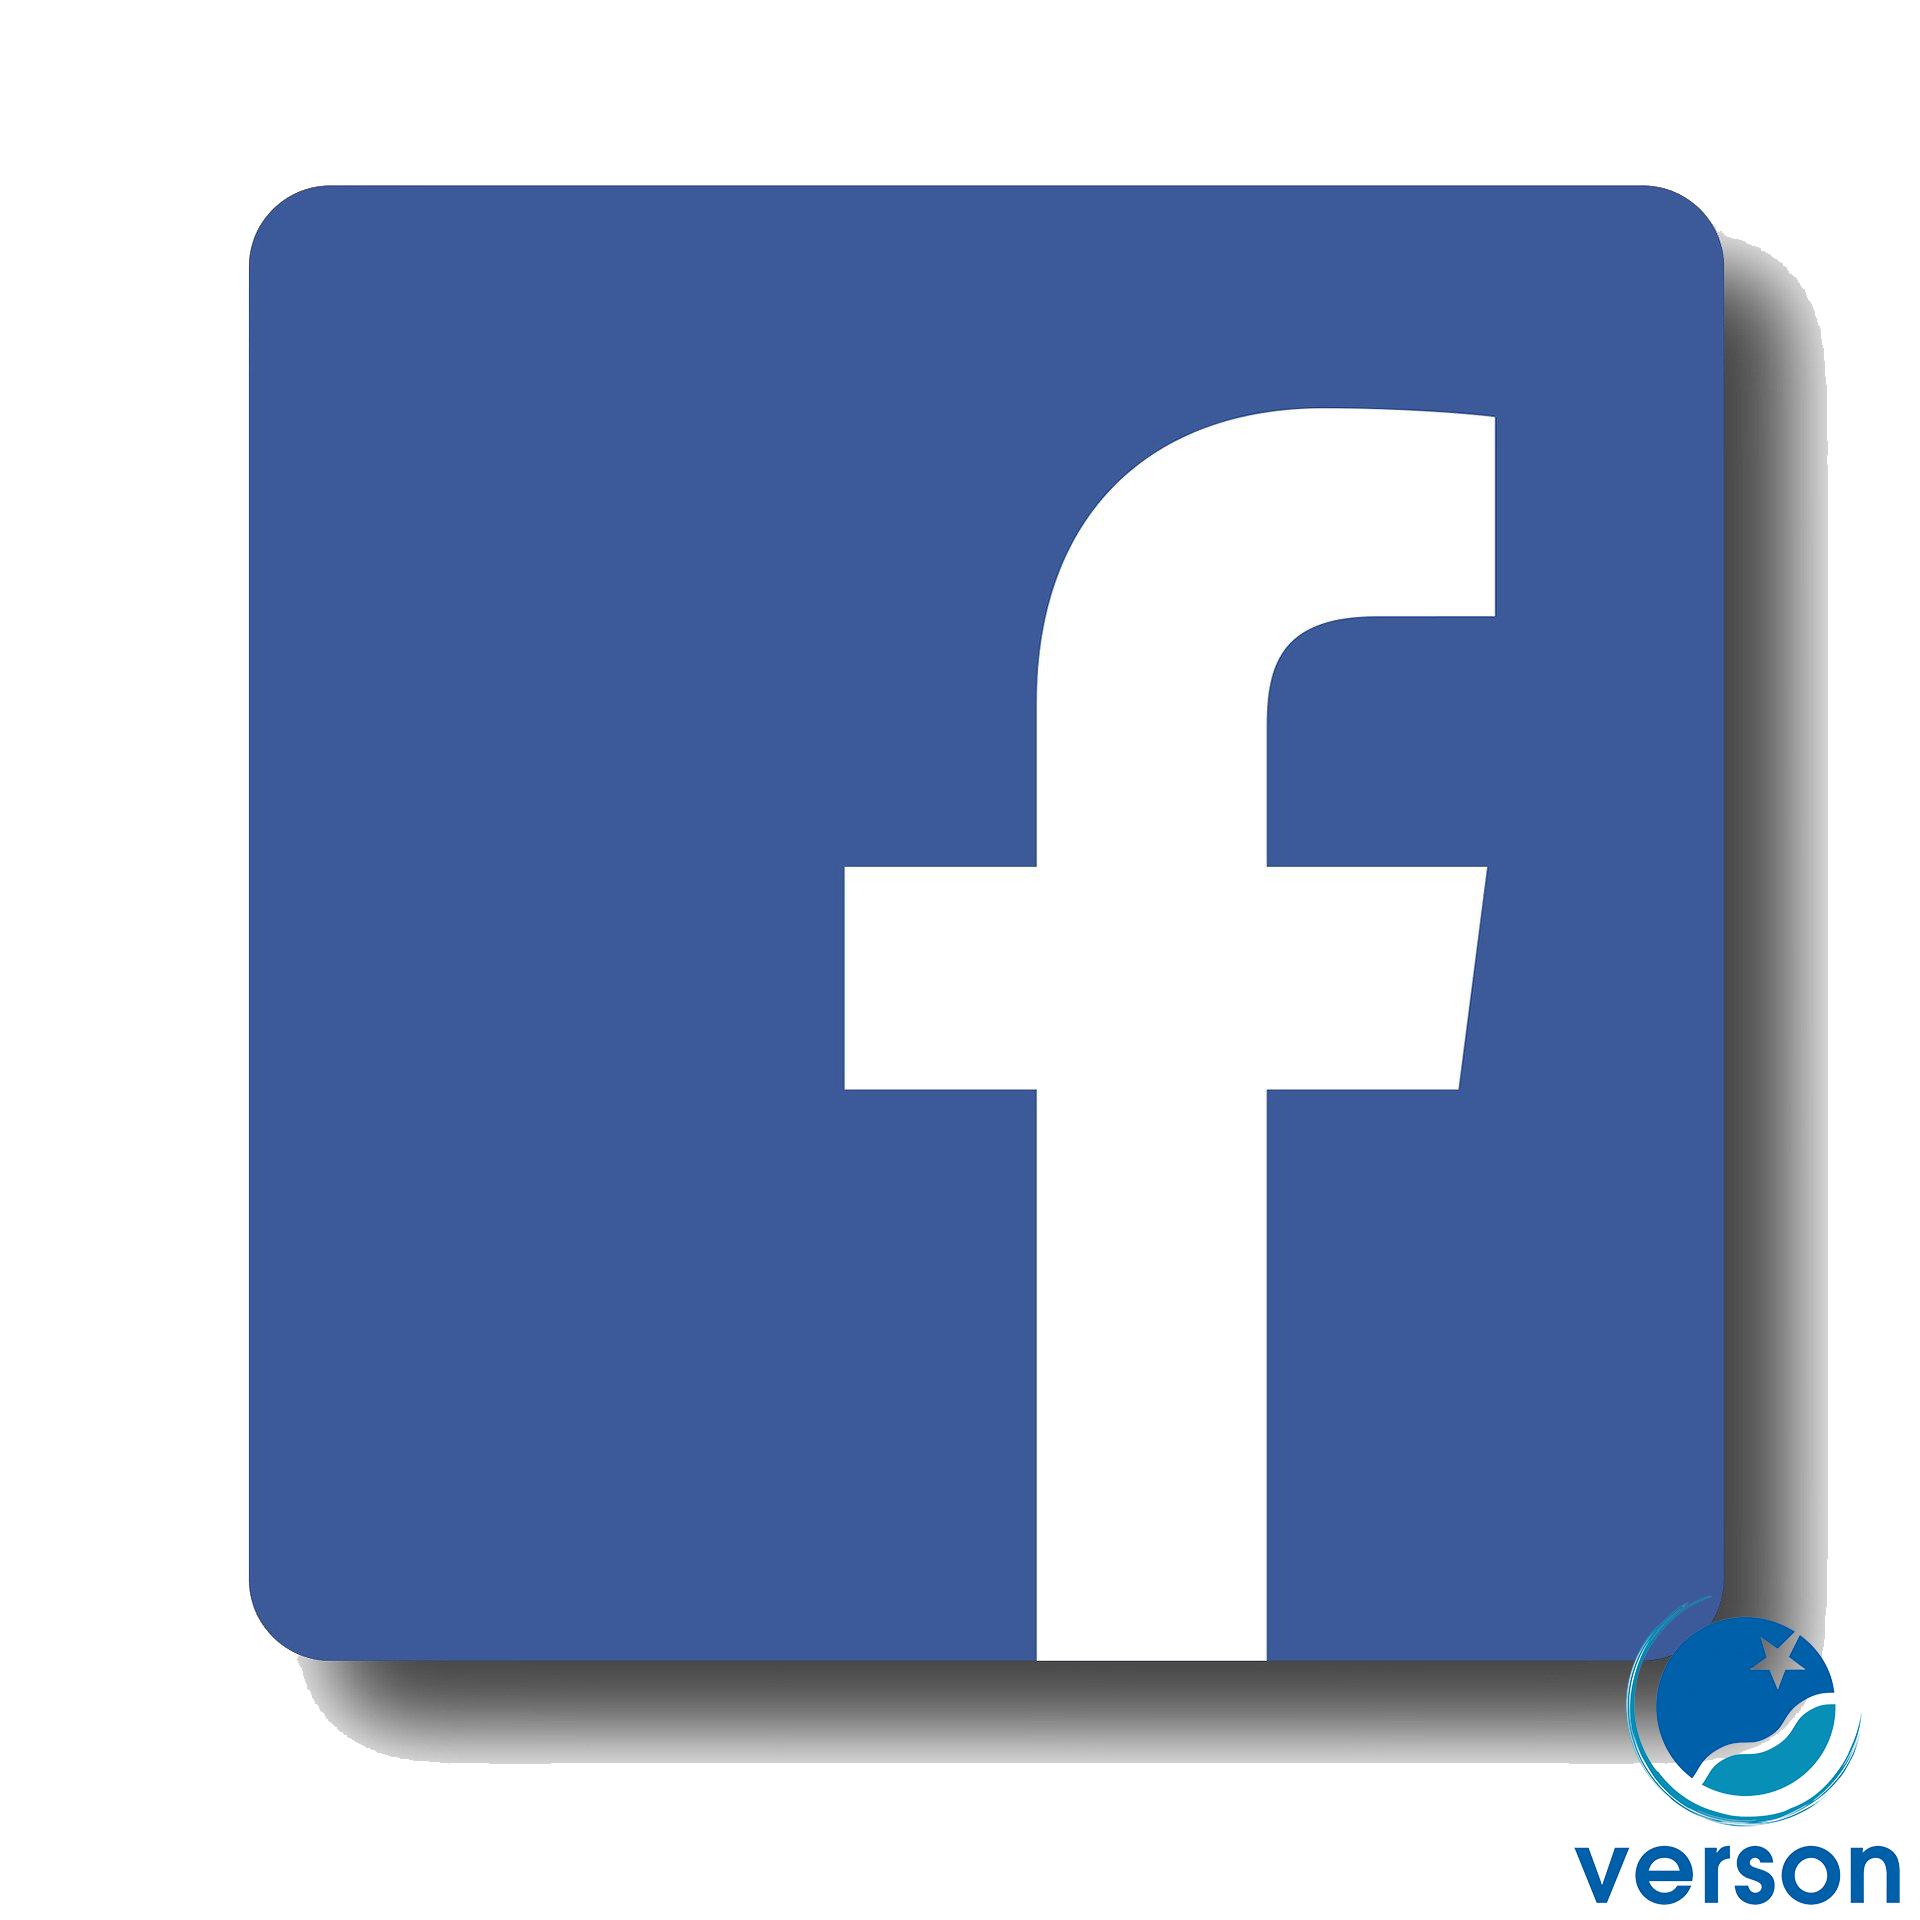 La Ville de Verson sur Facebook